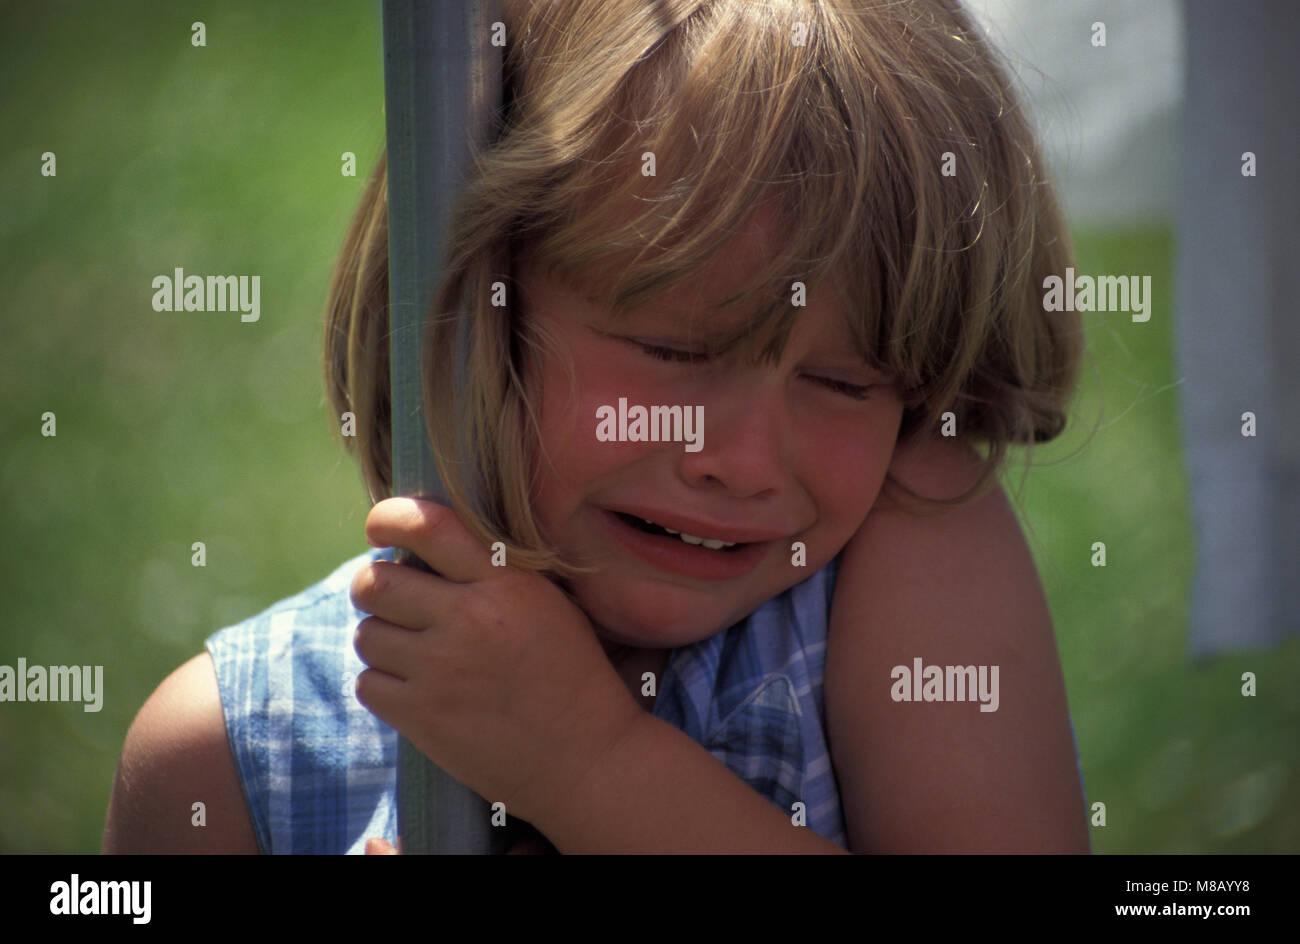 Little girl in playground having a tantrum - Stock Image